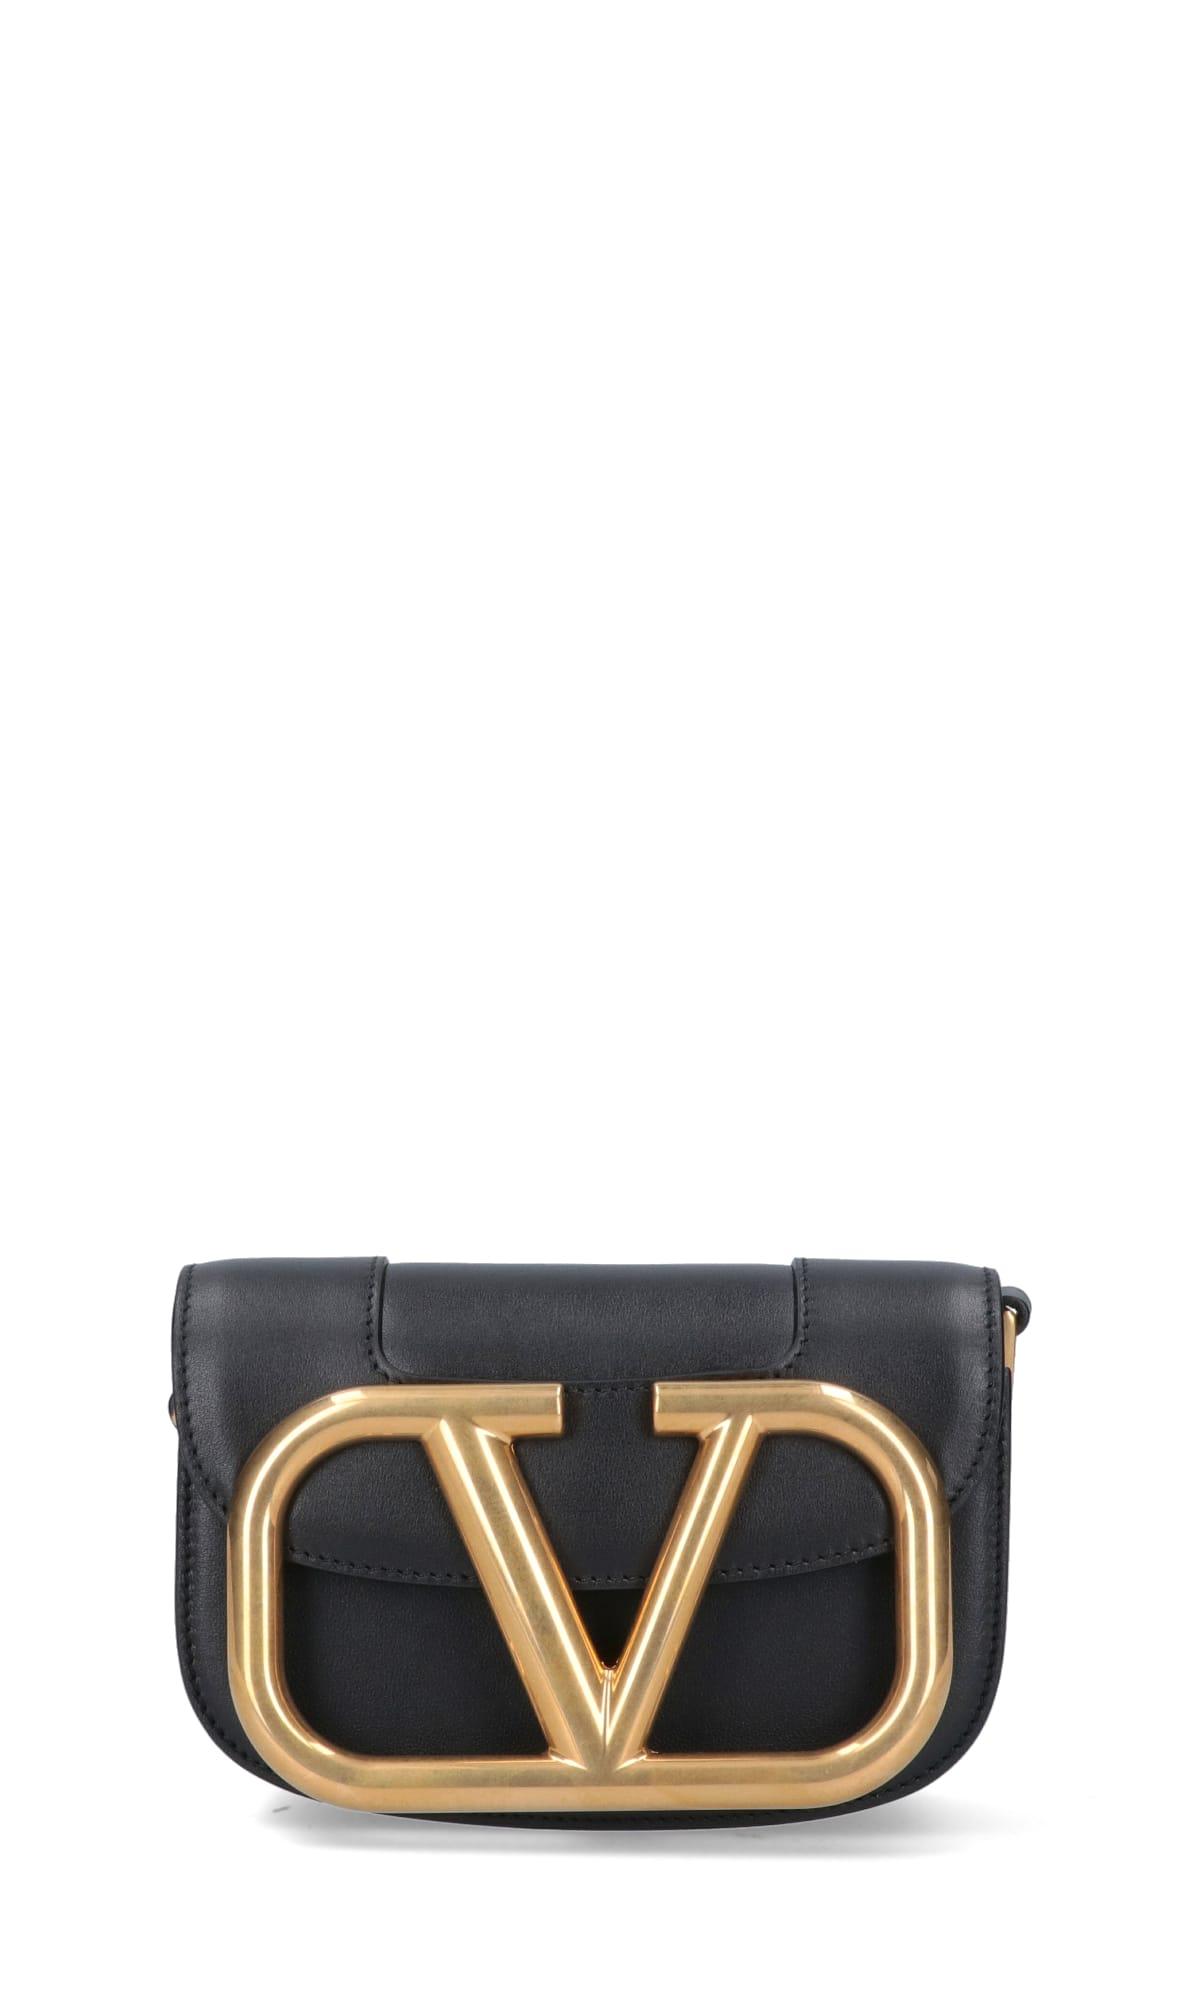 Valentino Garavani Shoulder Bag